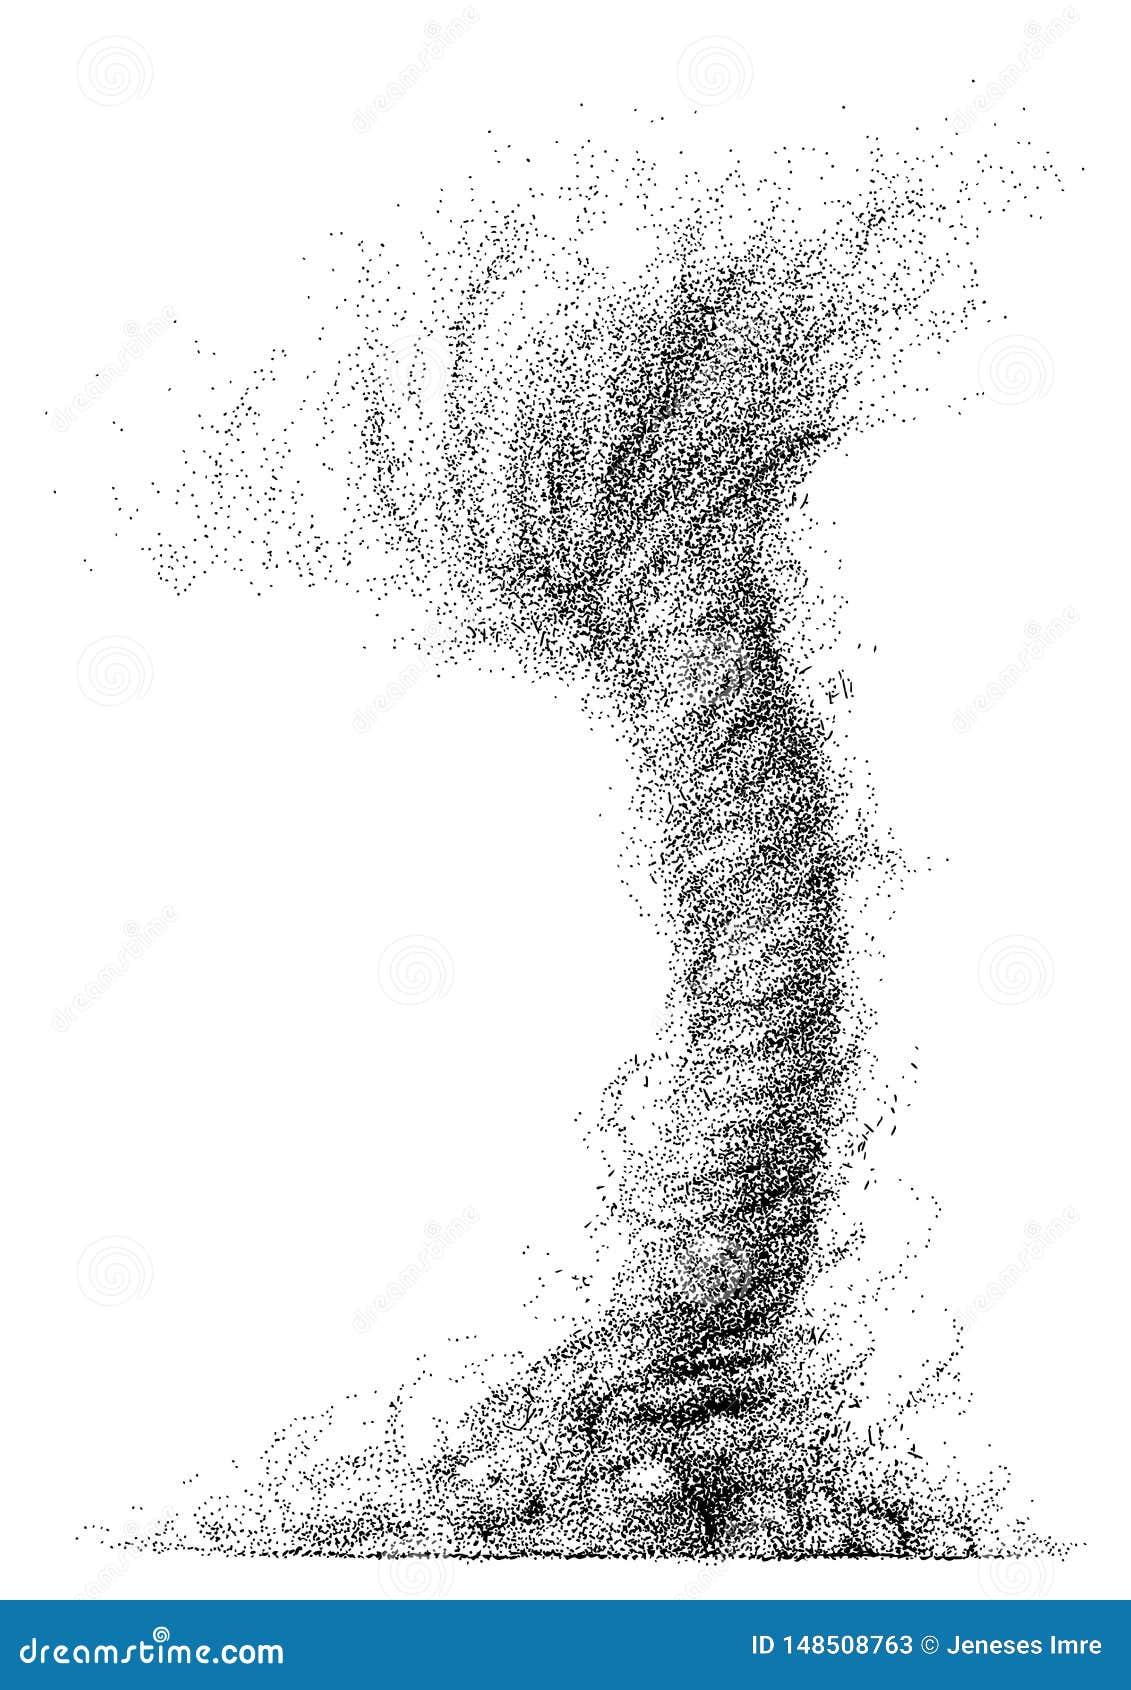 Illustration De Tornade Dessin Gravure Encre Schéma